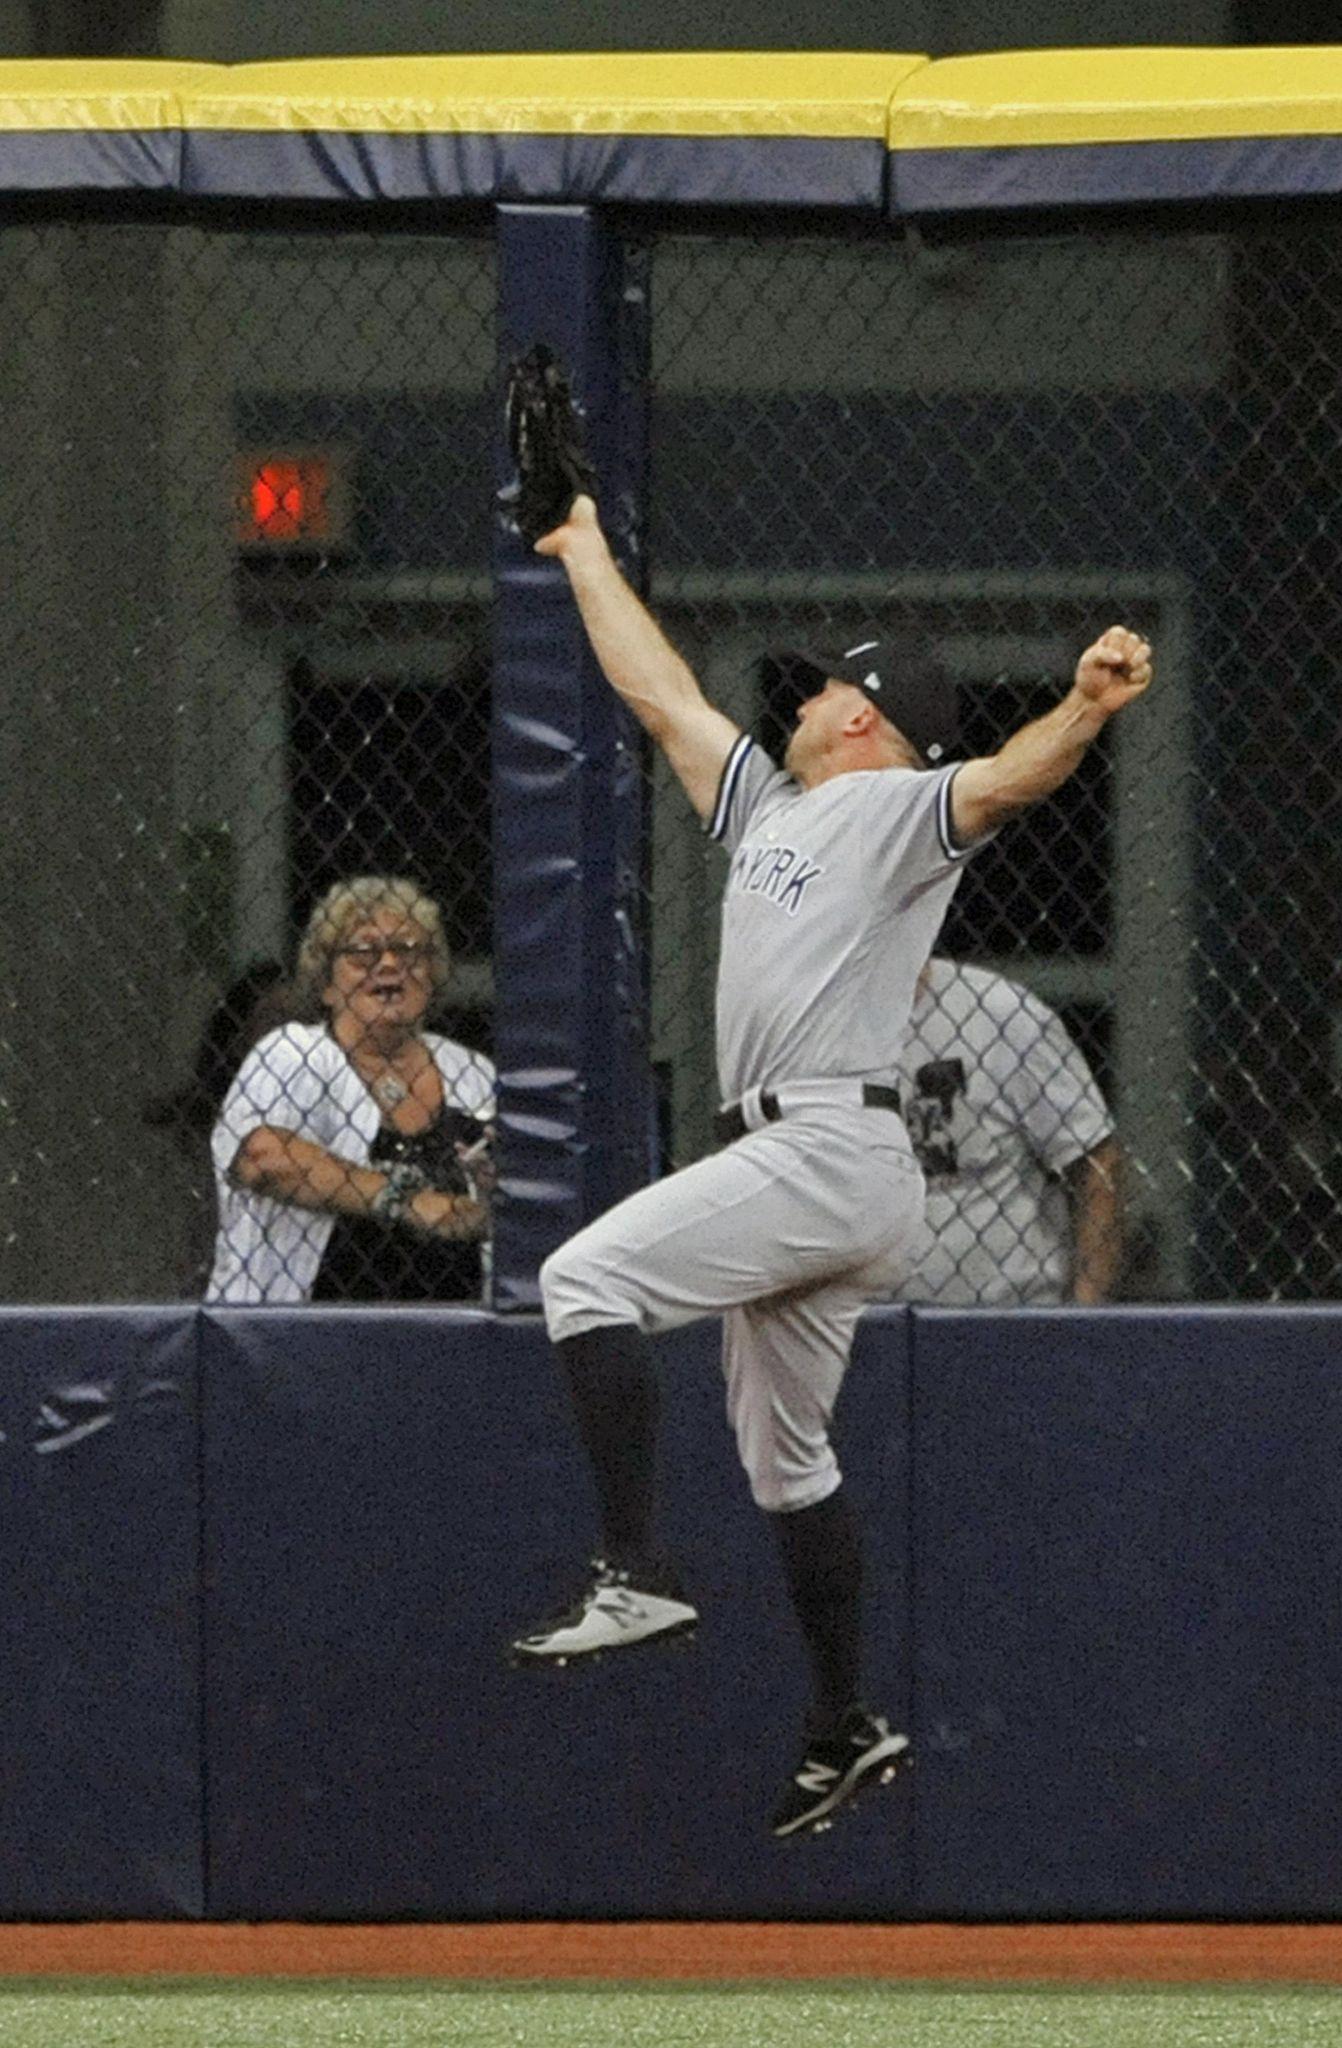 Yankees_rays_baseball_41155_s1342x2048